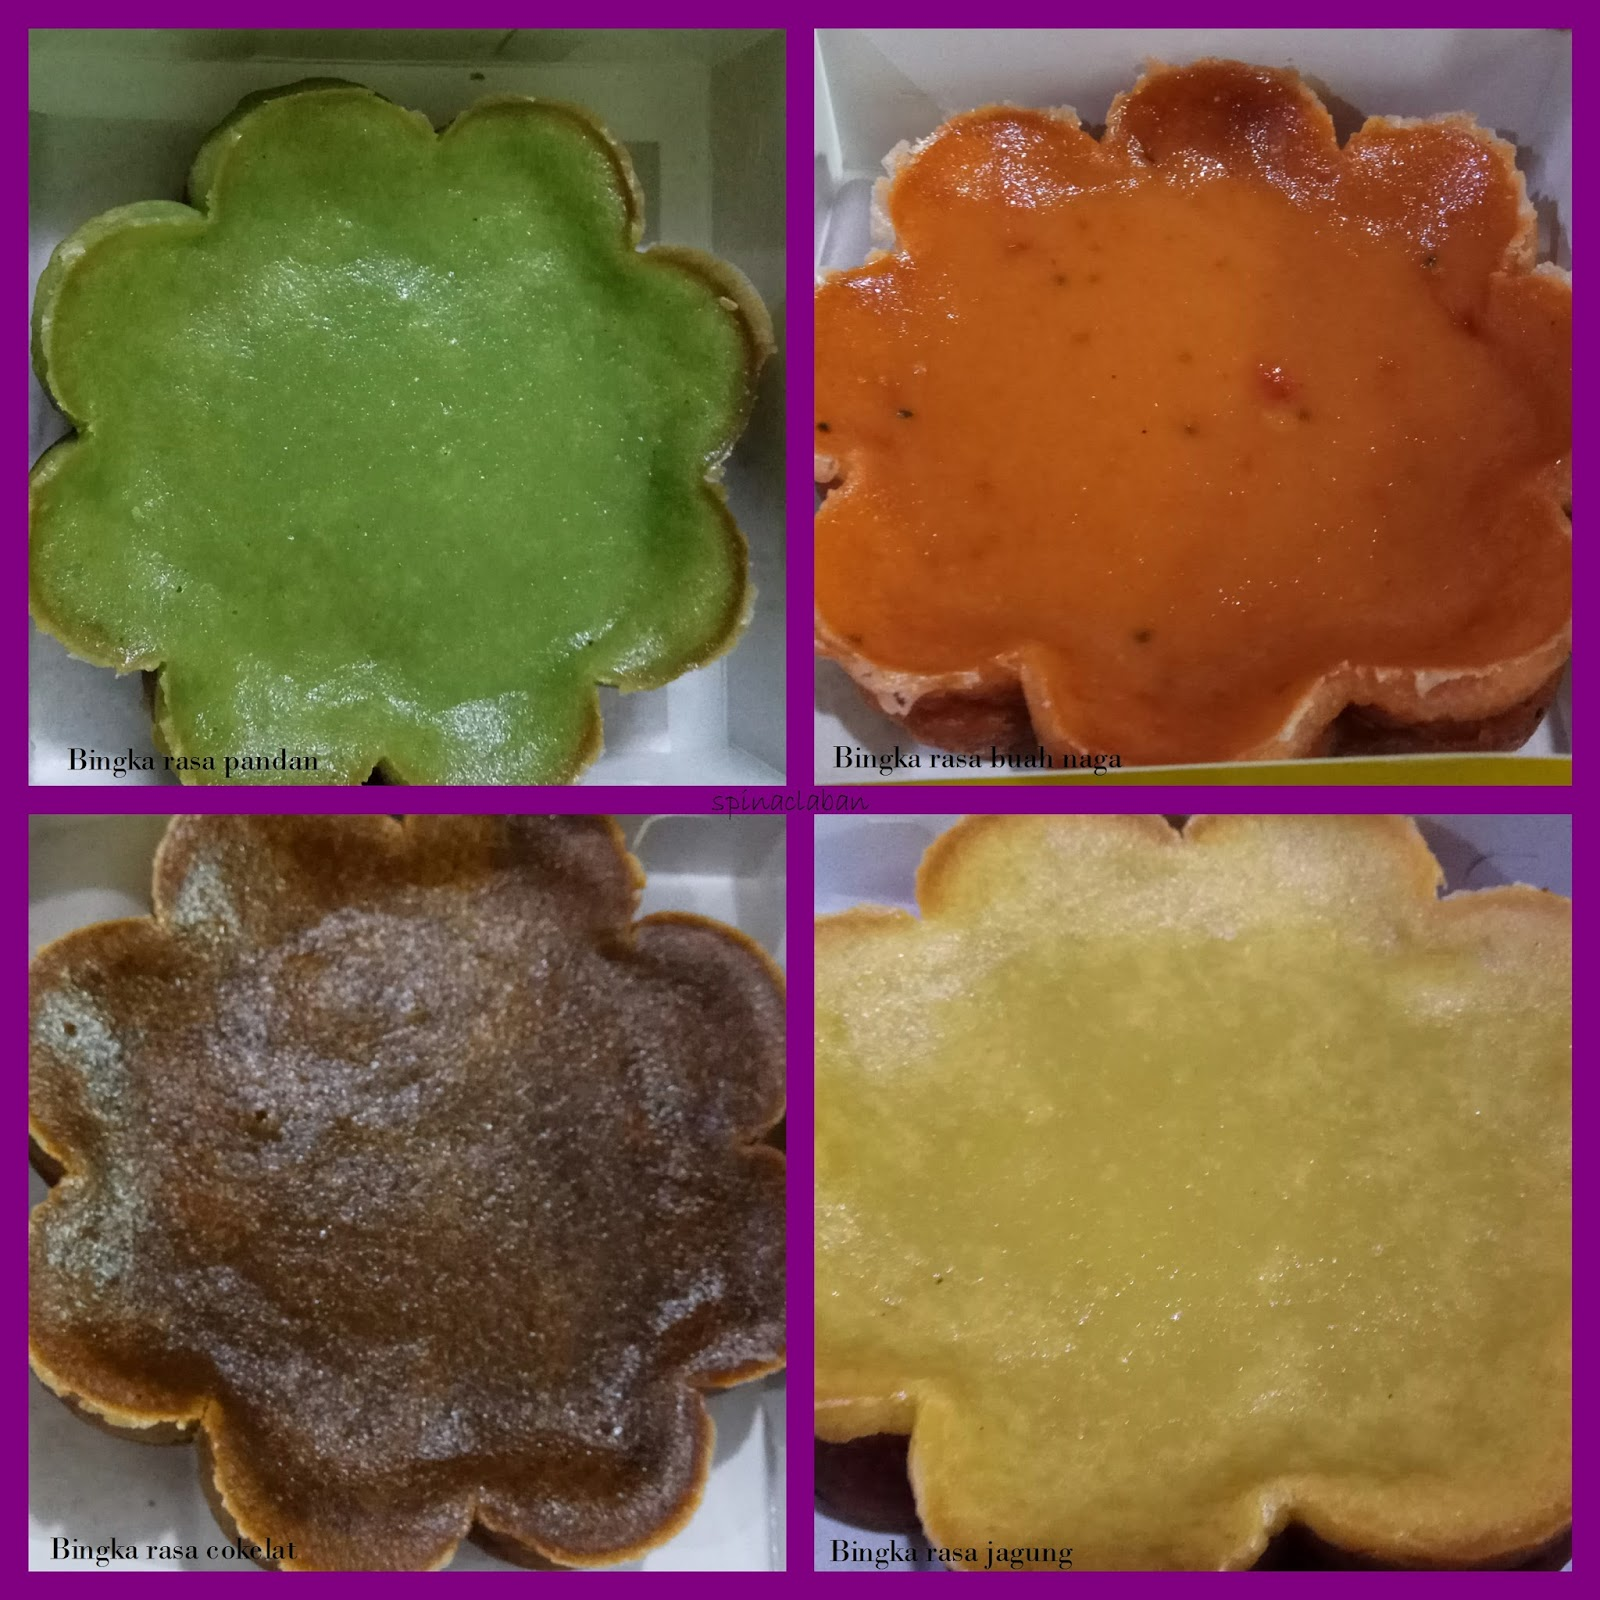 Kue Bingka Khas Batam Ya Nayadam Produk Ukm Dengan Berbagai Rasa